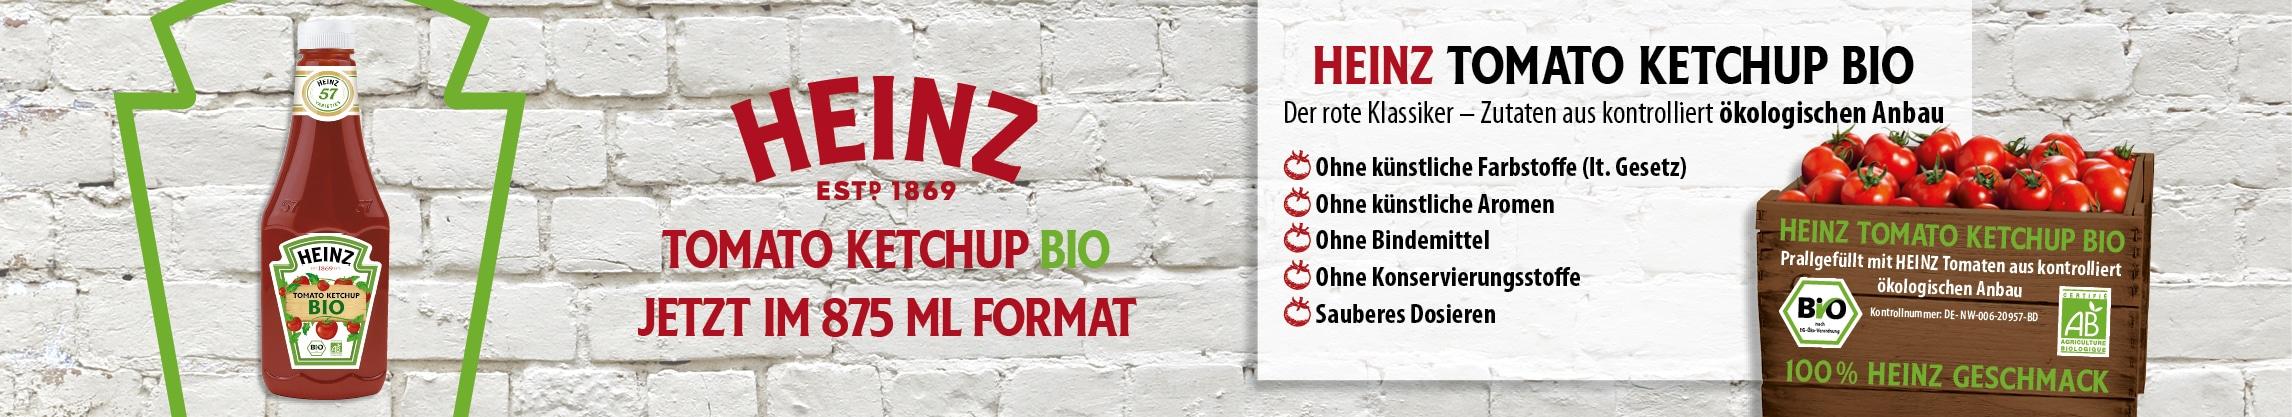 Banner Kraft Heinz Bio Ketchup